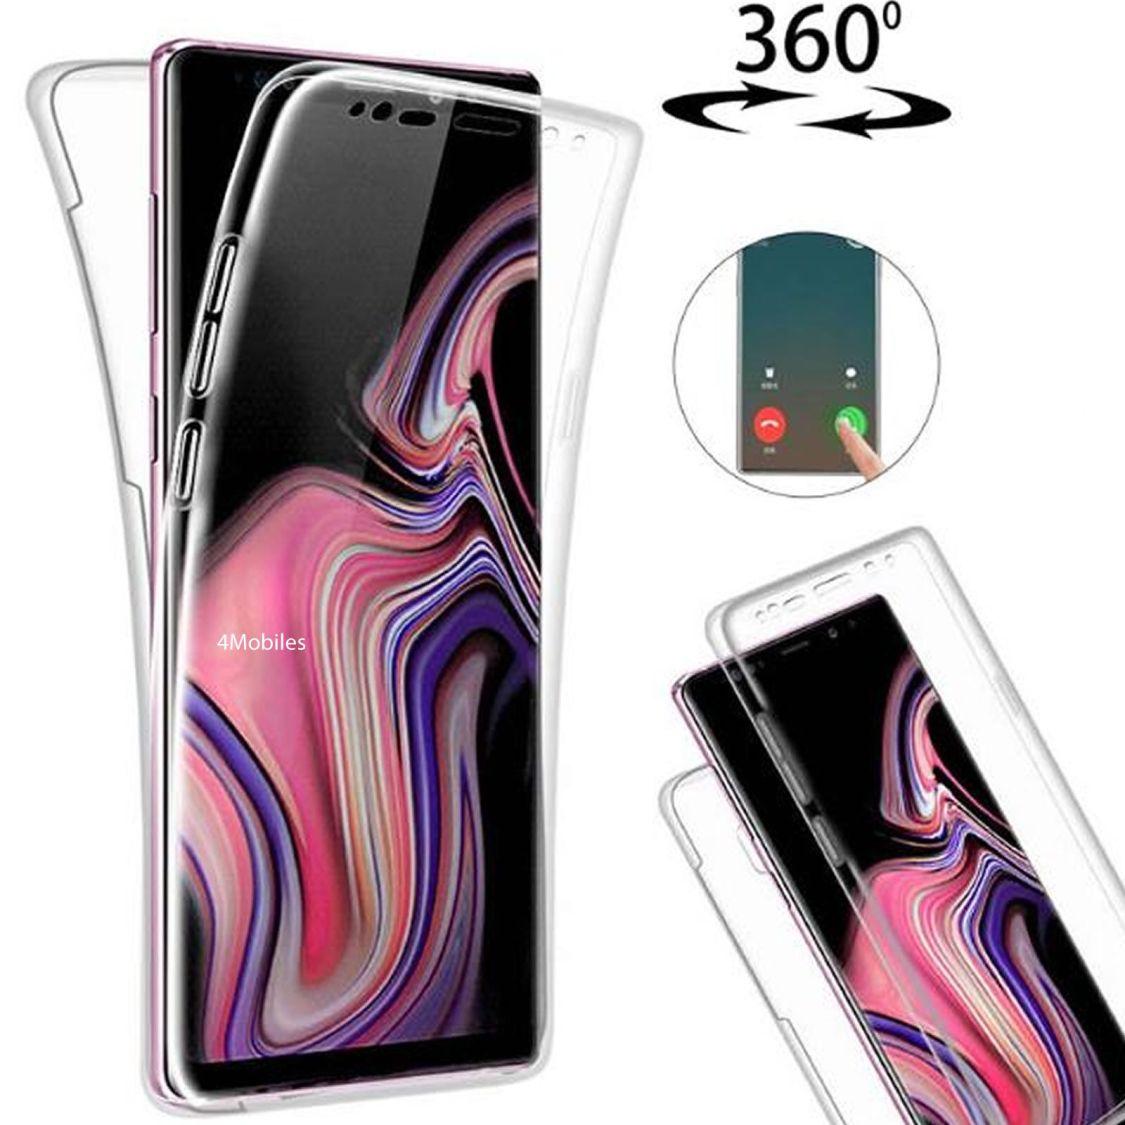 Für Samsung Galaxy S7 S7 Edge Handy Hülle Cover Case Full TPU Schutzhülle Klar